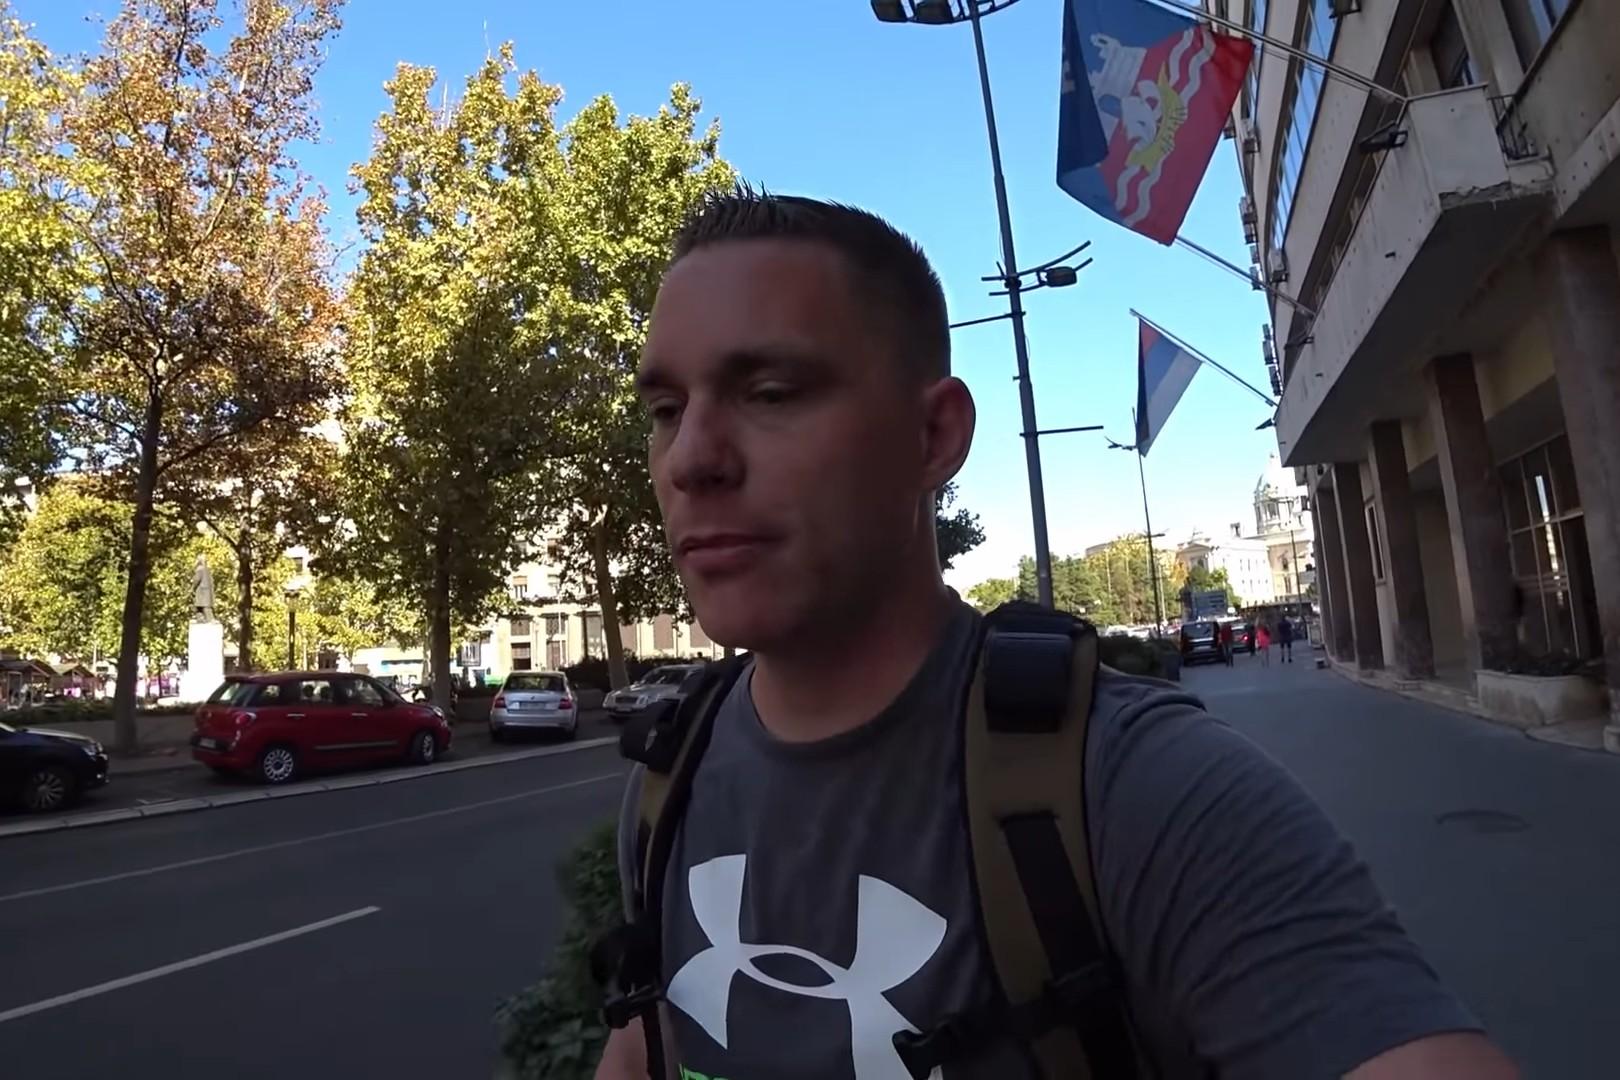 Bred Beket tokom šetnje u blizini Terazija u Beogradu (Foto: Snimak ekrana/Jutjub)